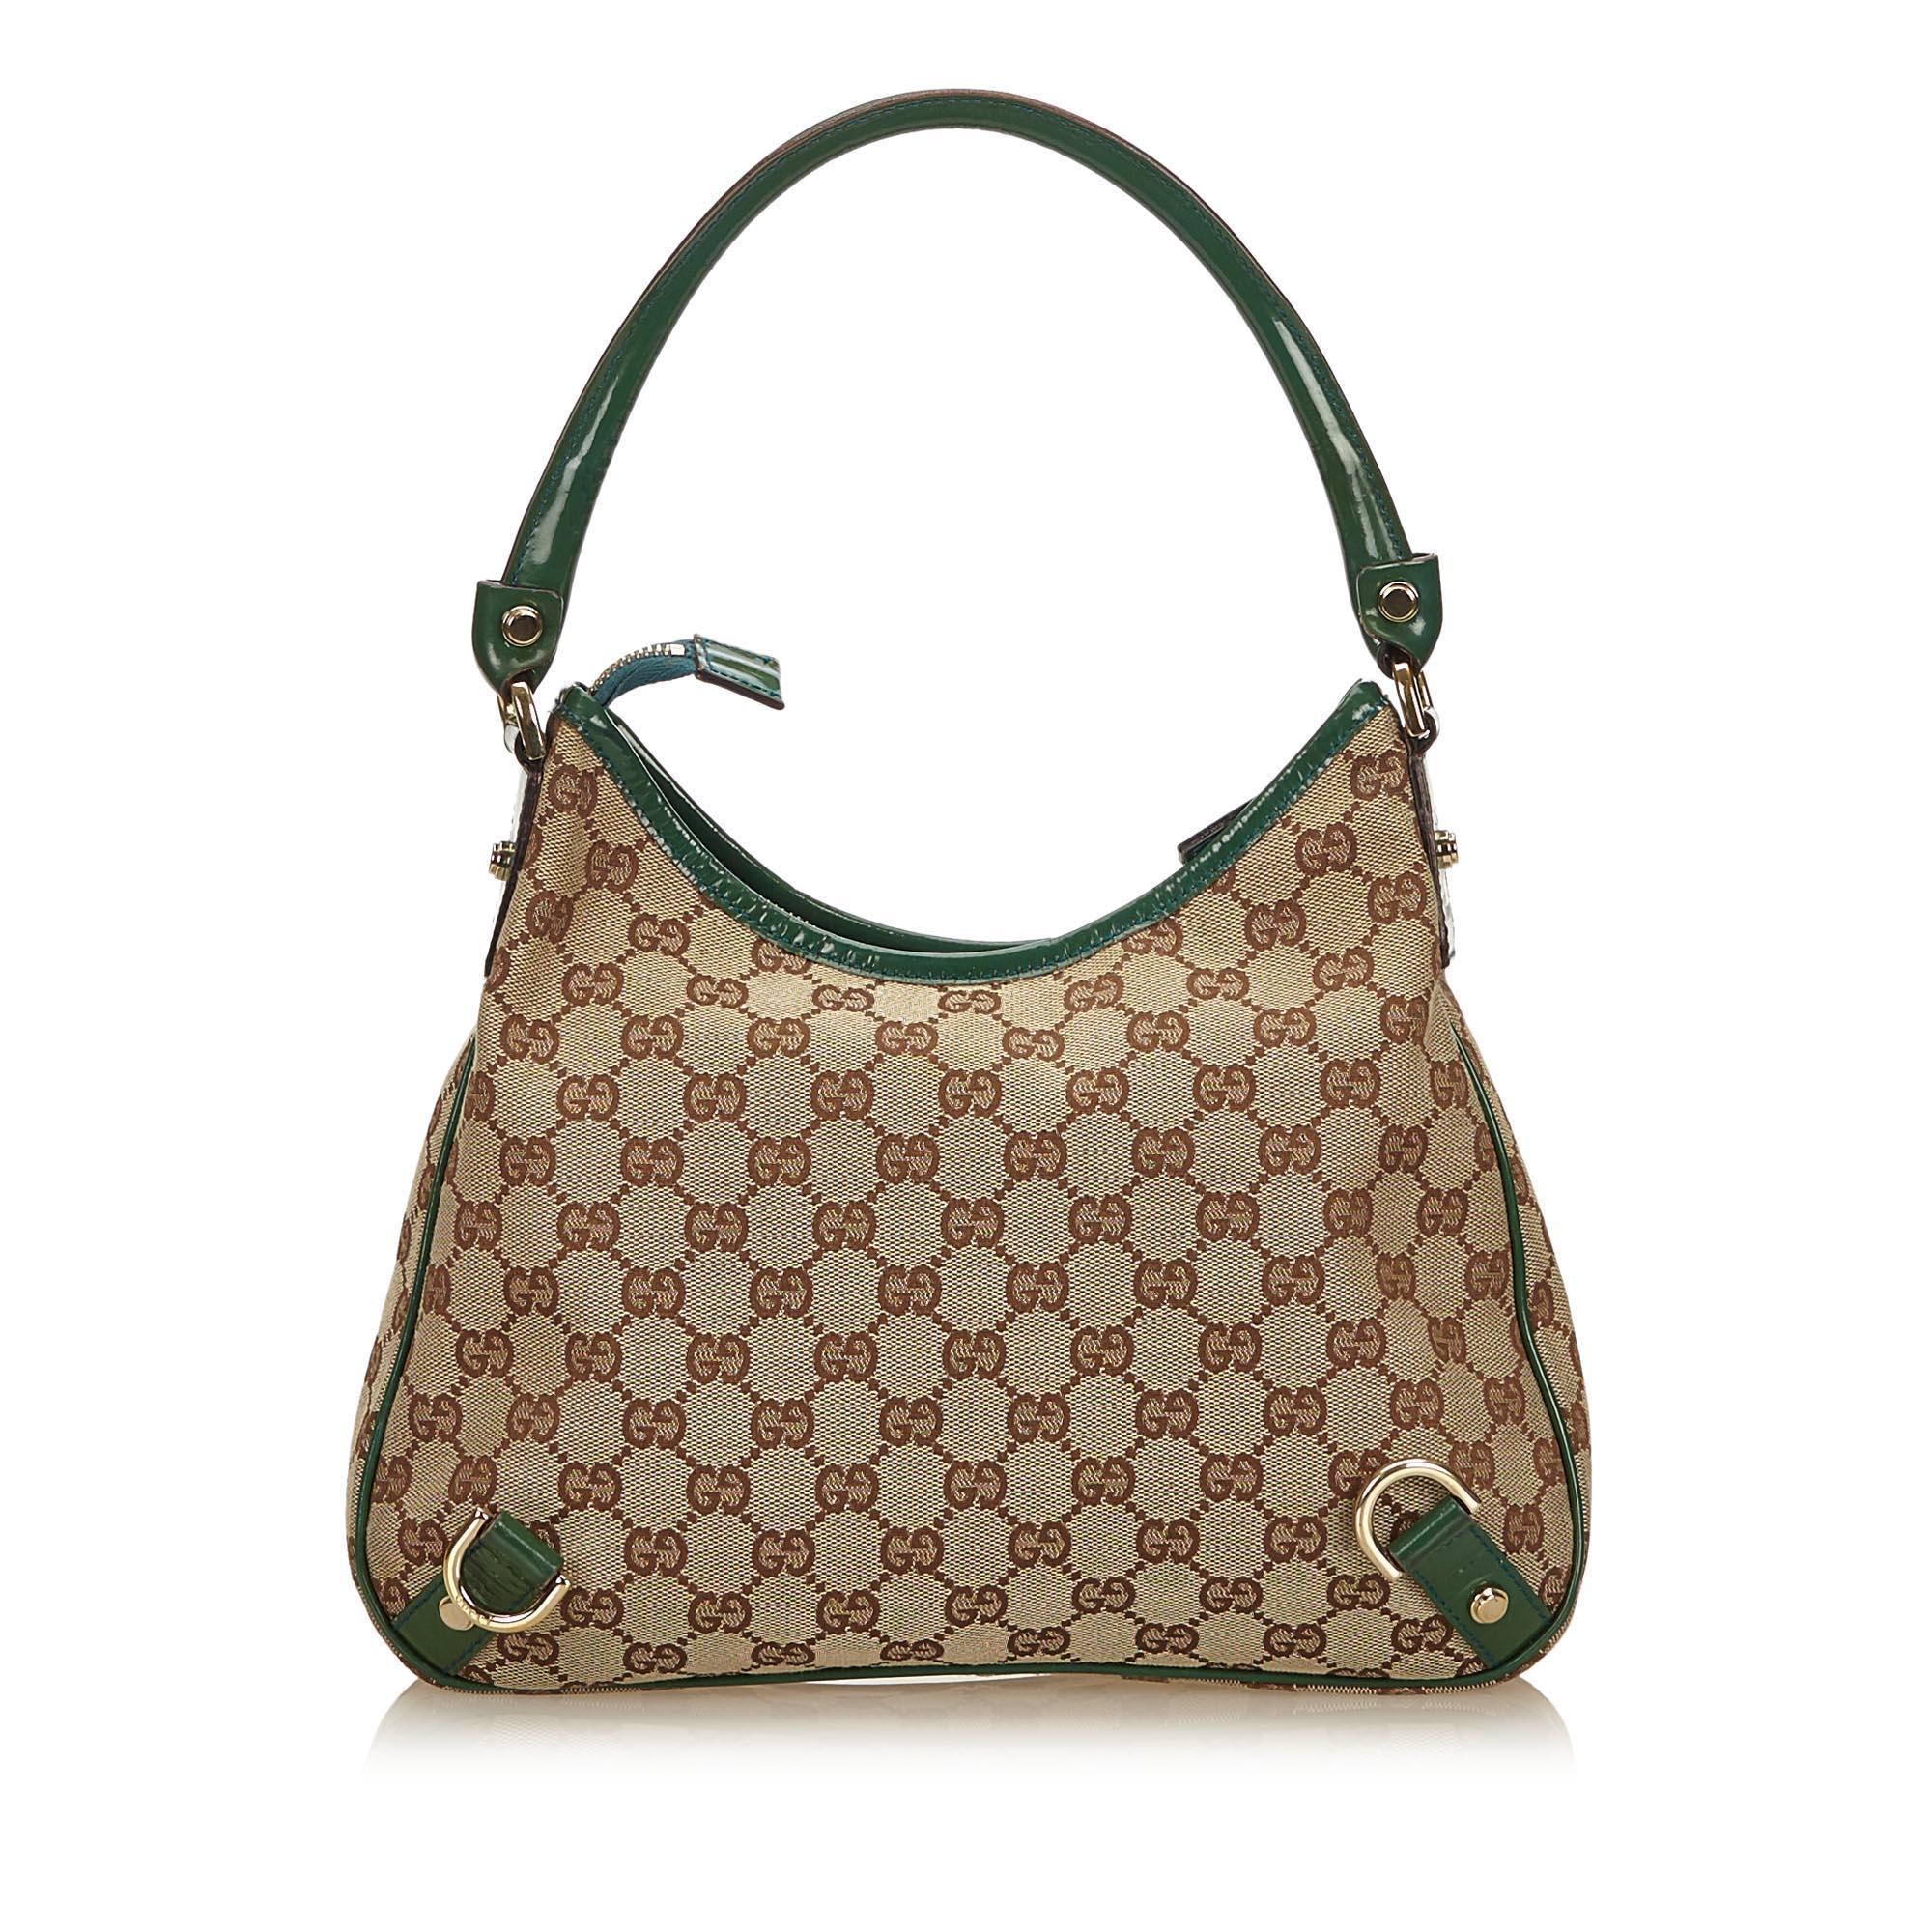 f7b661e811c Gucci Brown x Green Guccissima Jacquard Abbey Hobo Bag at 1stdibs